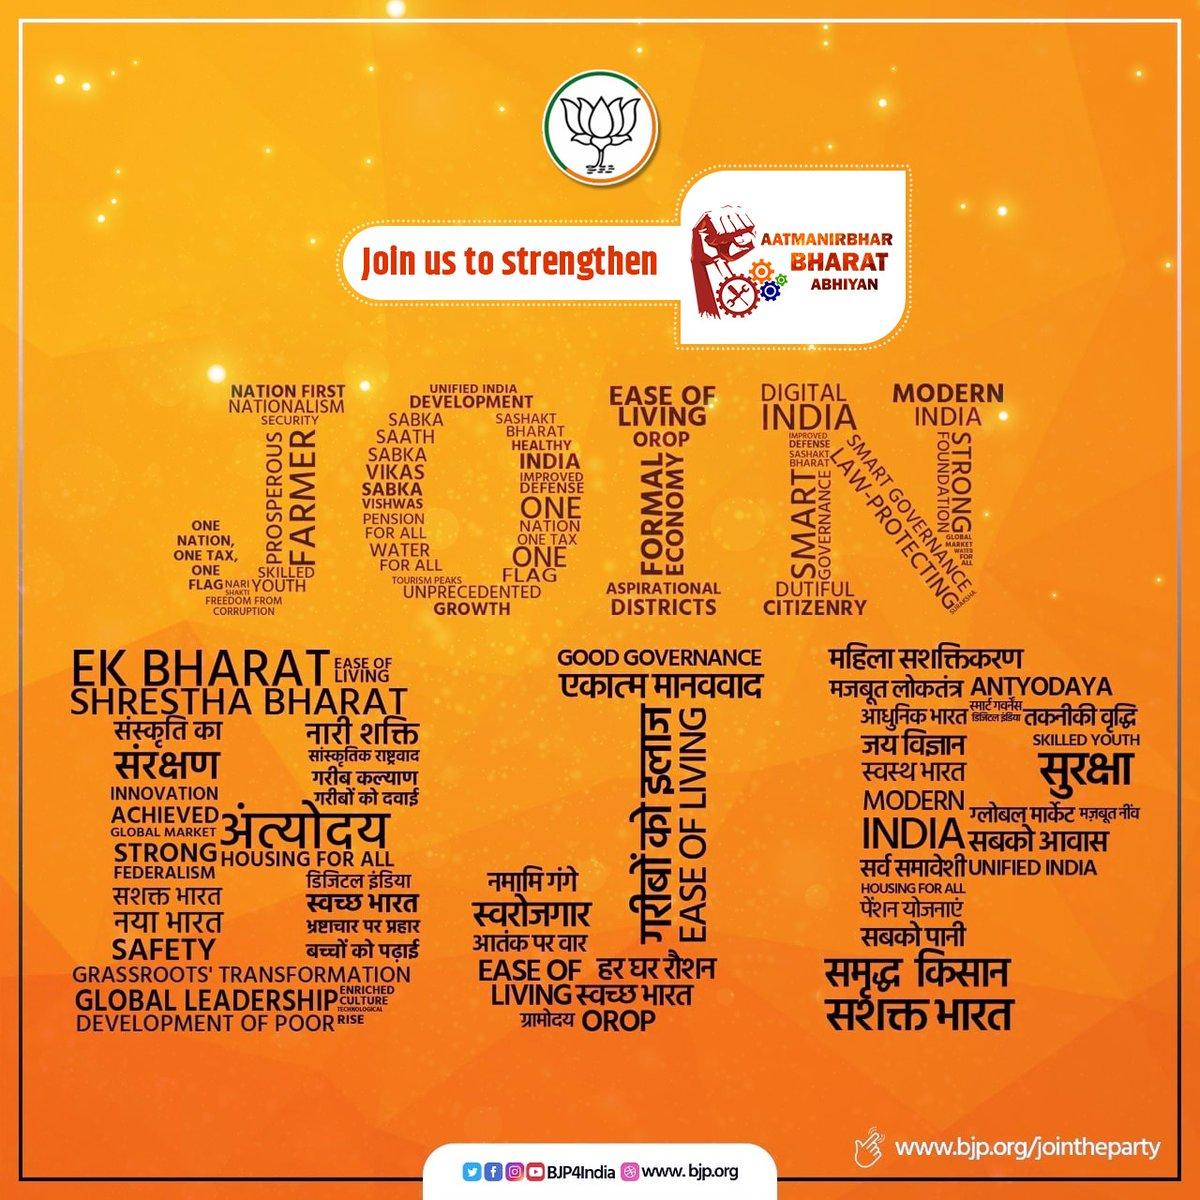 Come forward to strengthen #AatmaNirbharBharat Abhiyan. #JoinBJP at